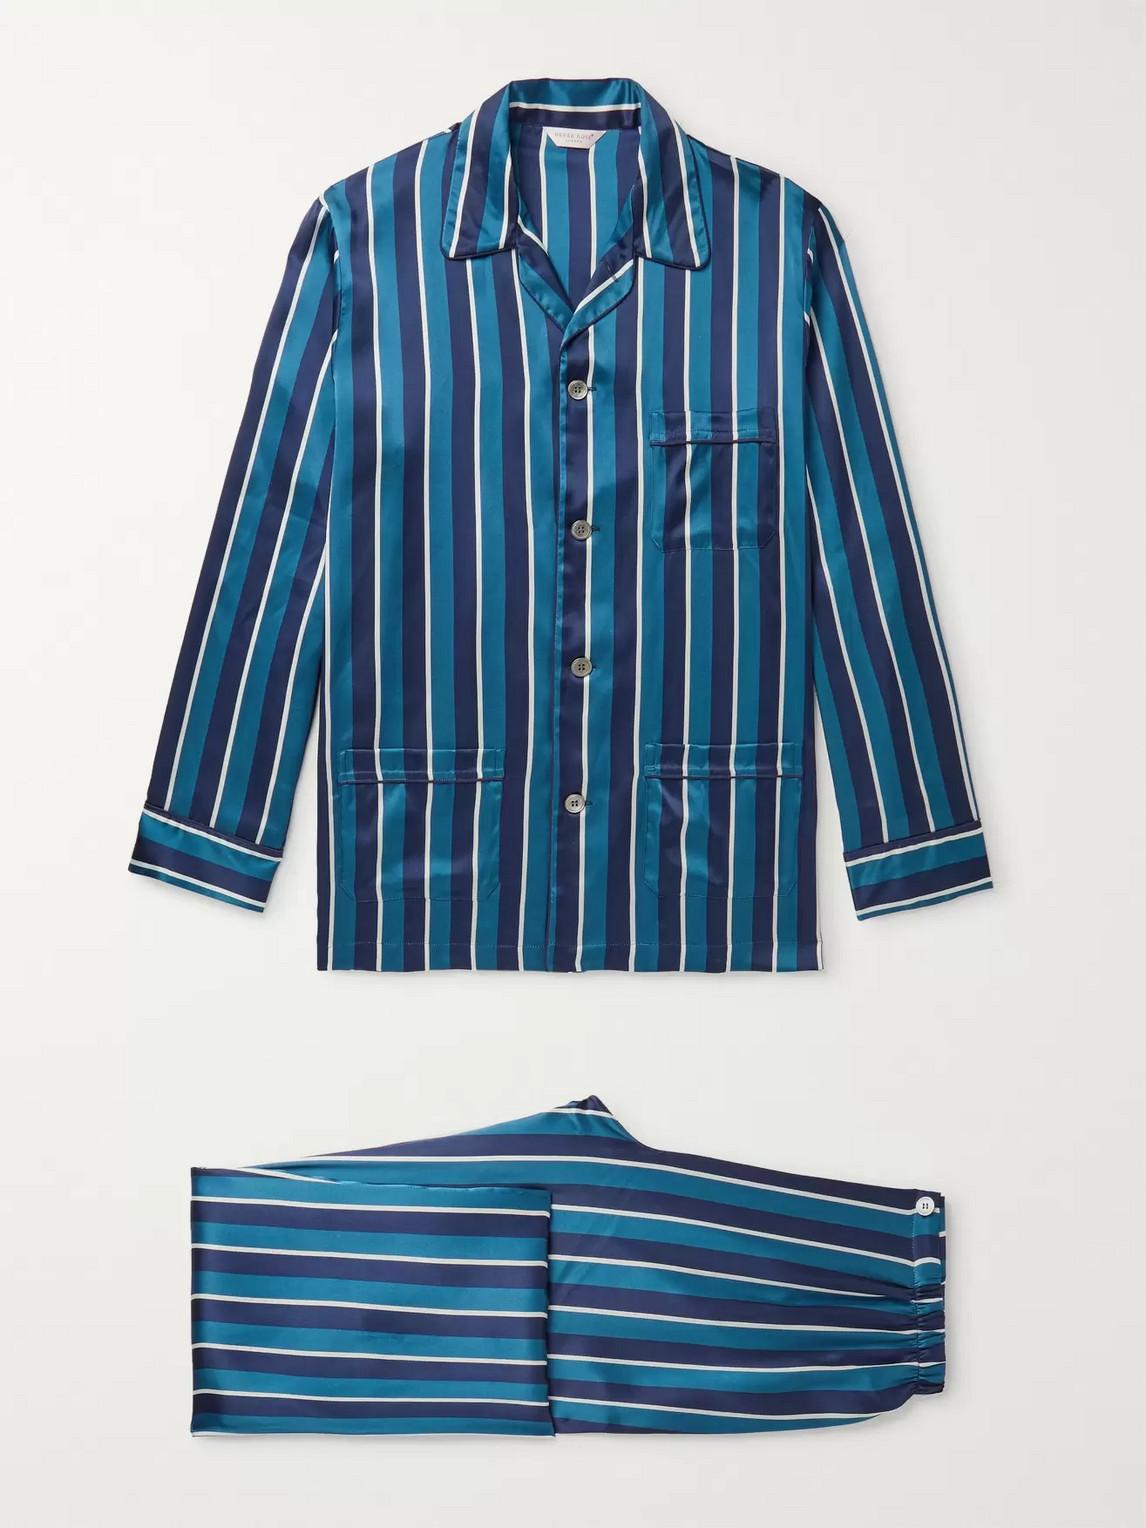 derek rose - brindisi striped silk pyjama set - blue - m - men